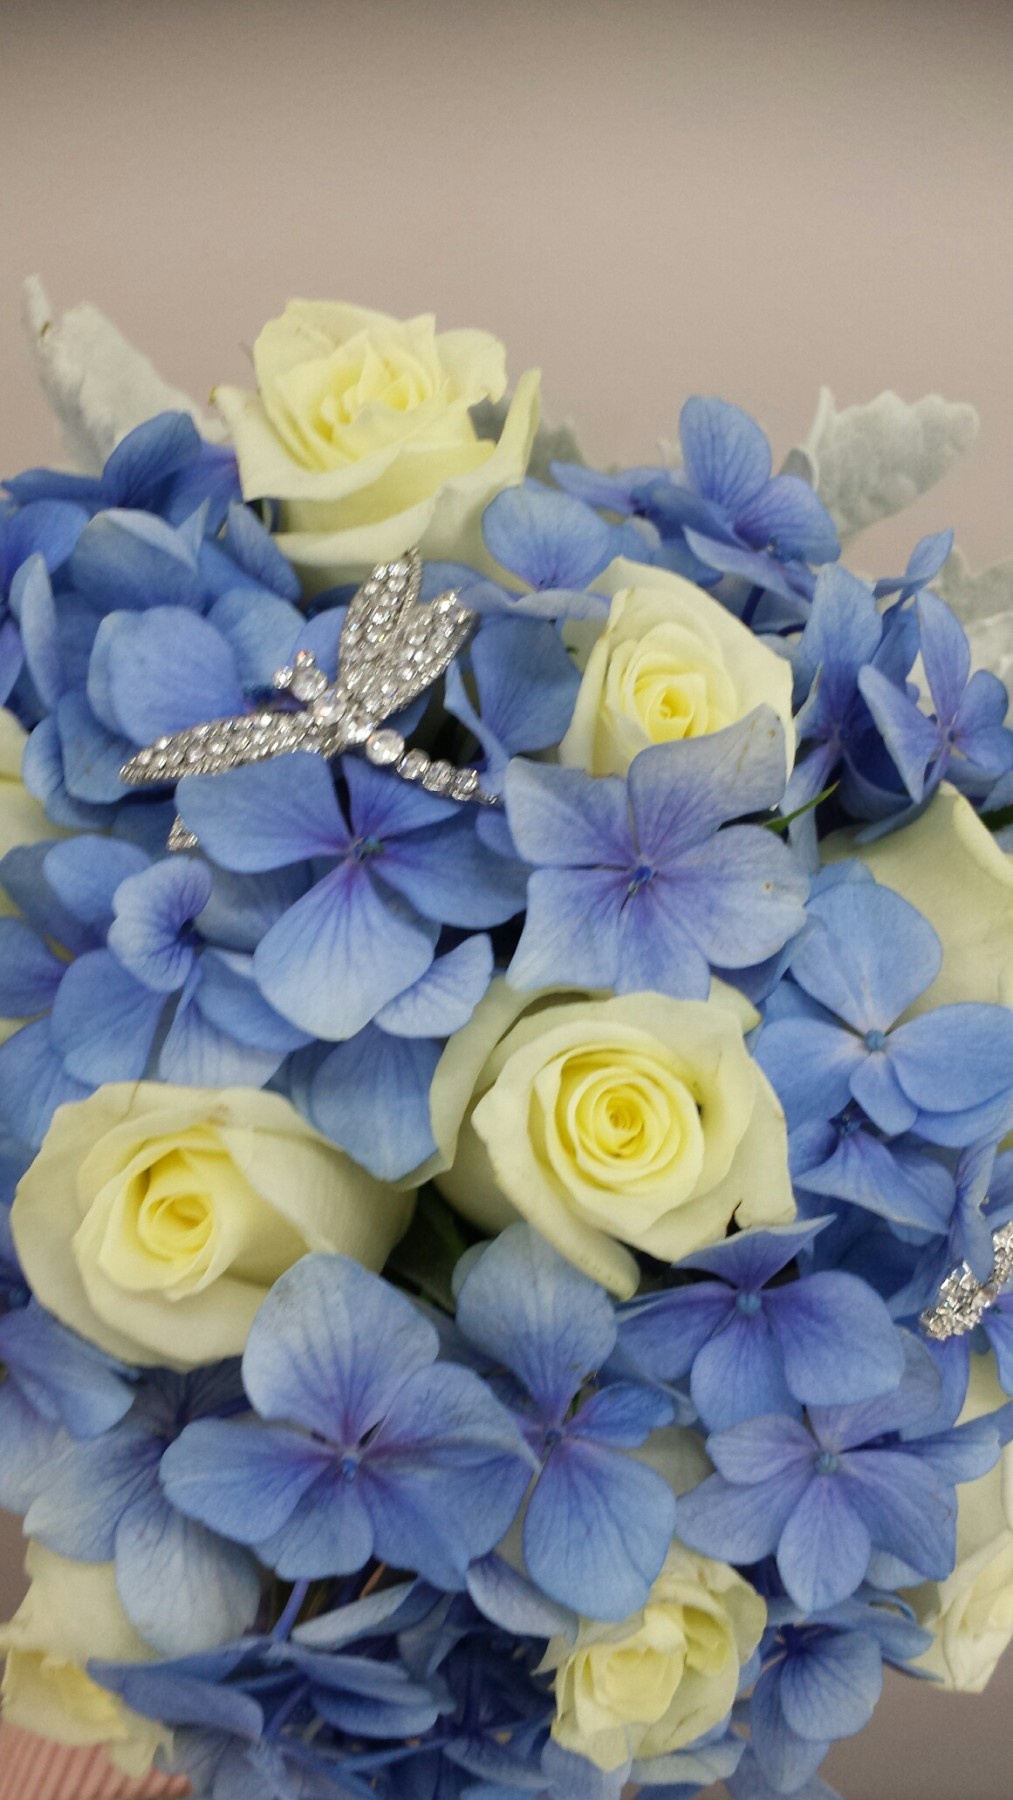 blue Hygrangea and white roses